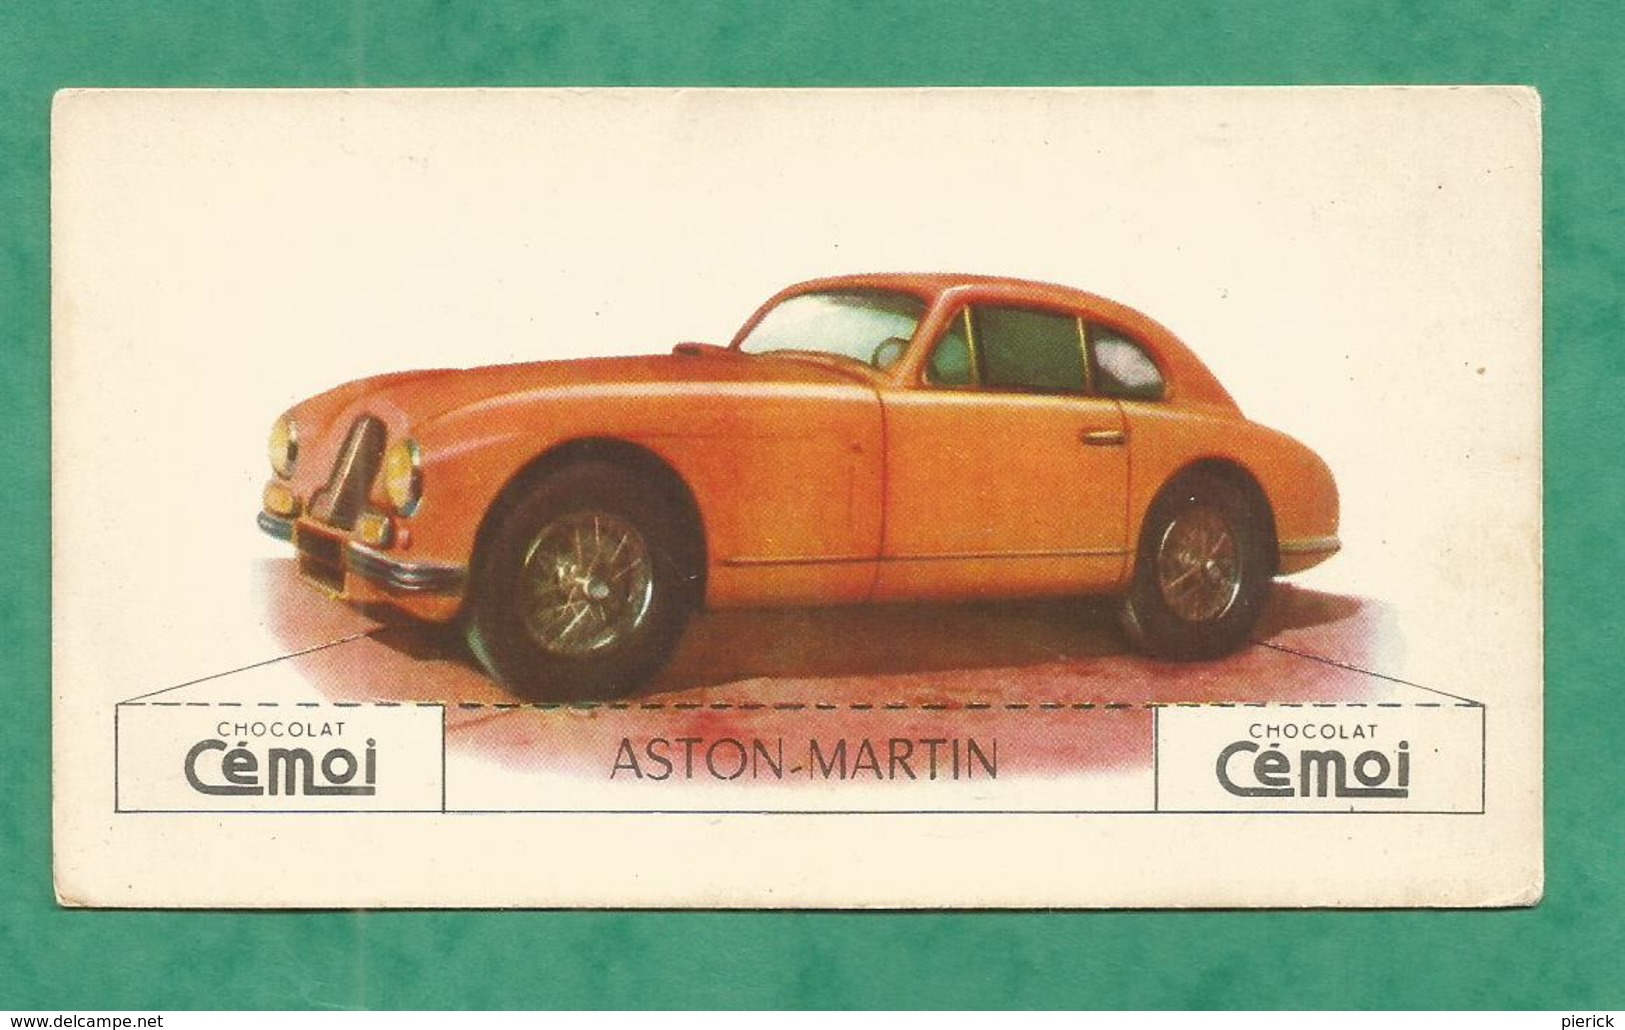 IMAGE CHOCOLAT CEMOI AUTO VOITURE VINTAGE WAGEN OLD CAR CARD ASTON MARTIN - Chocolat